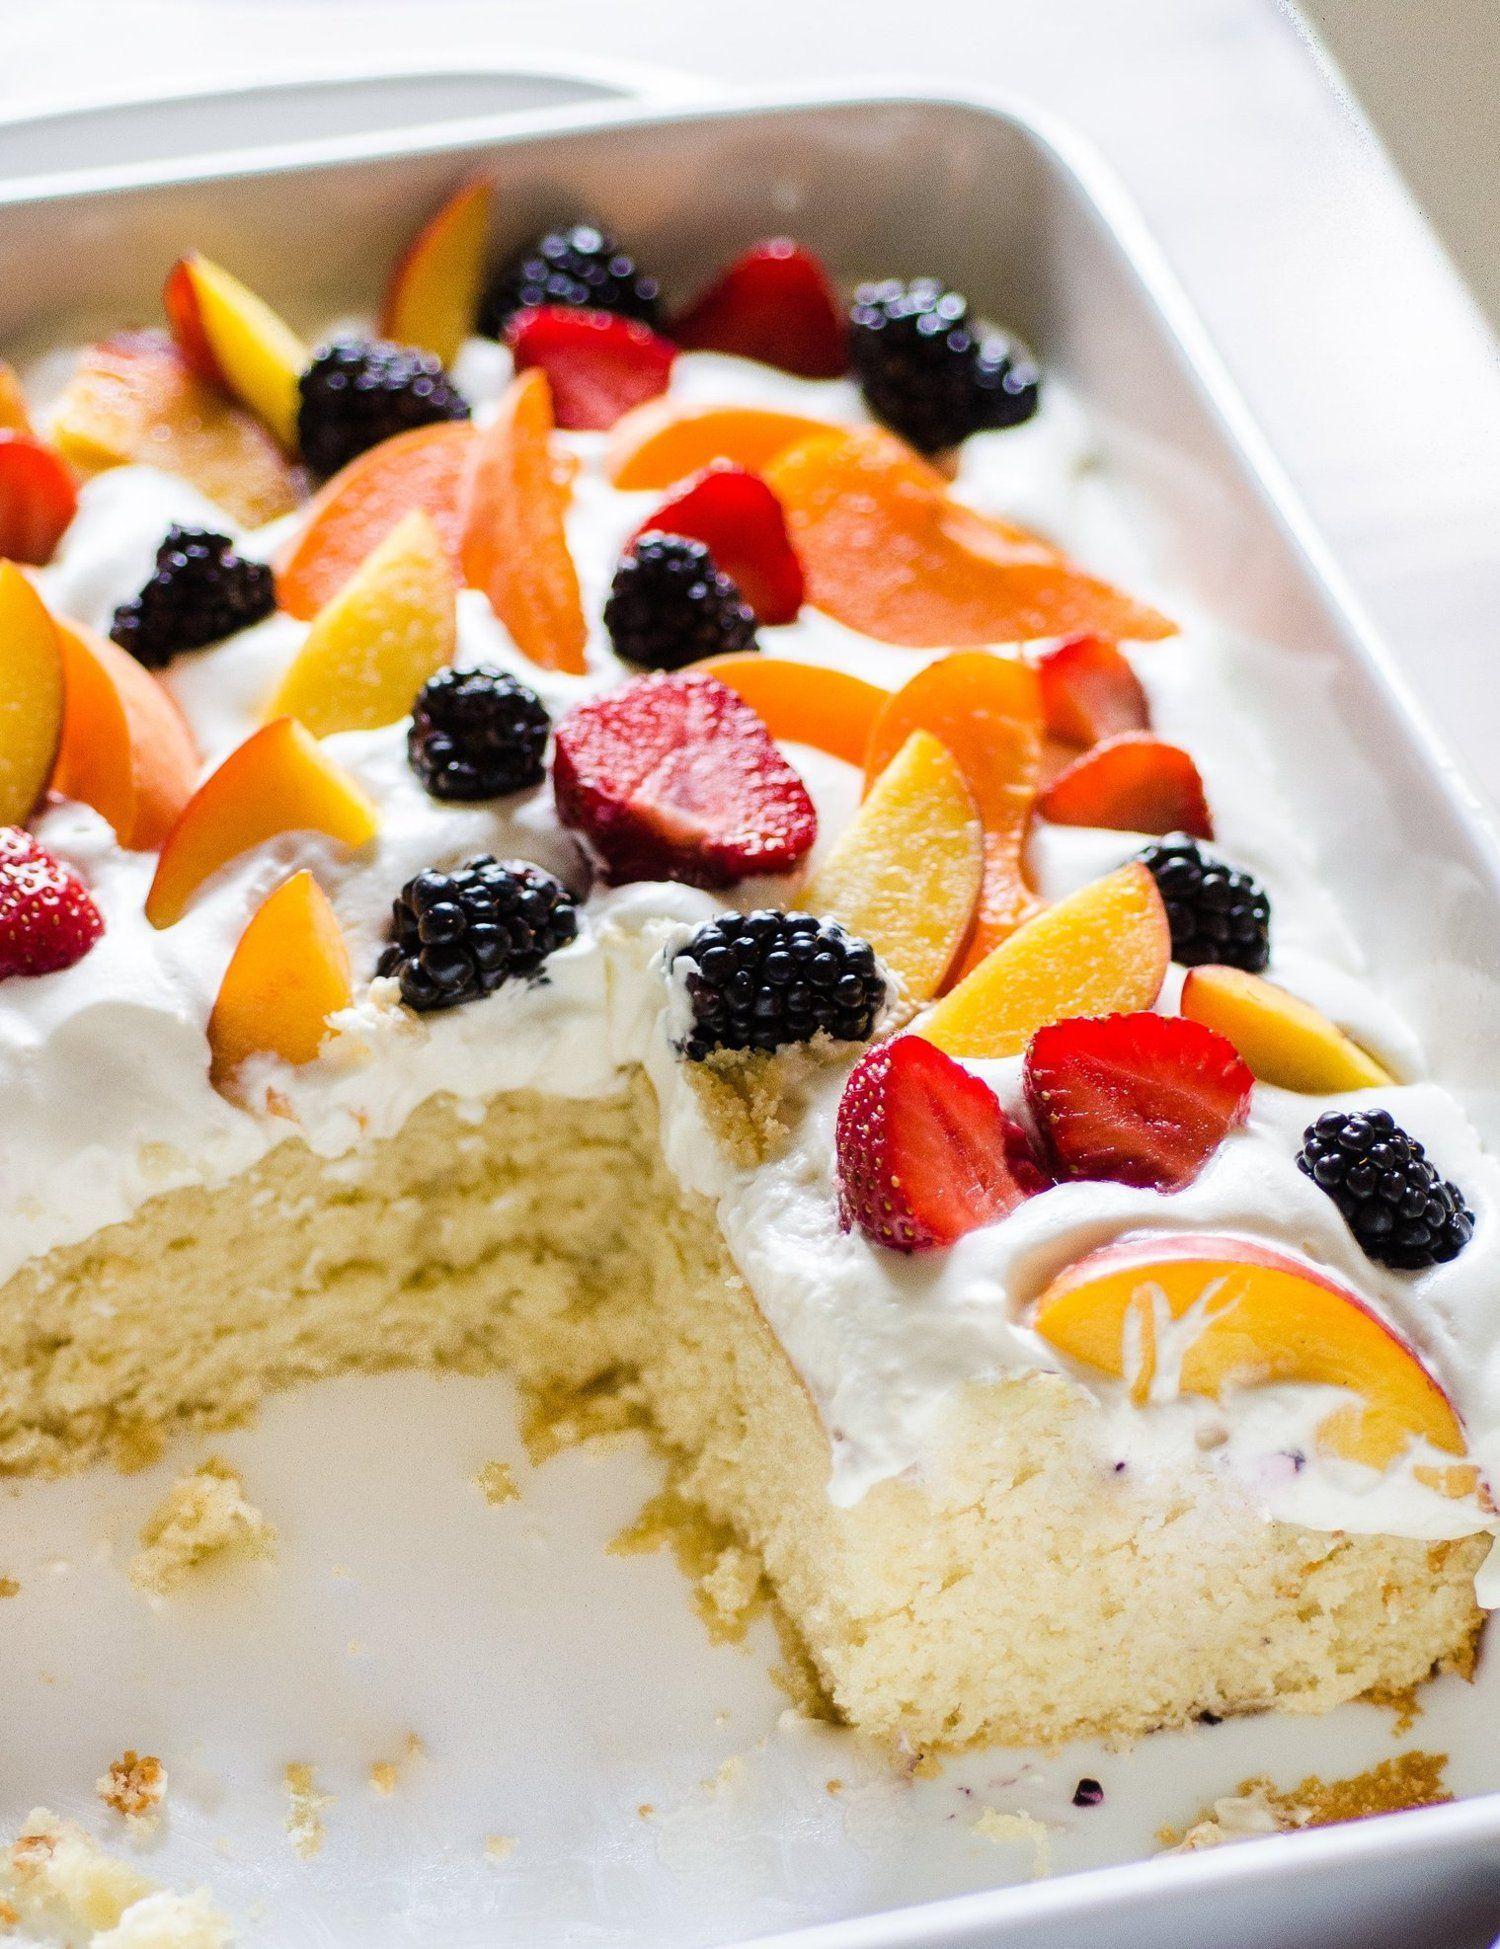 Summer Fruit Desserts  Easy Summer Cake with Fruit & Cream Recipe